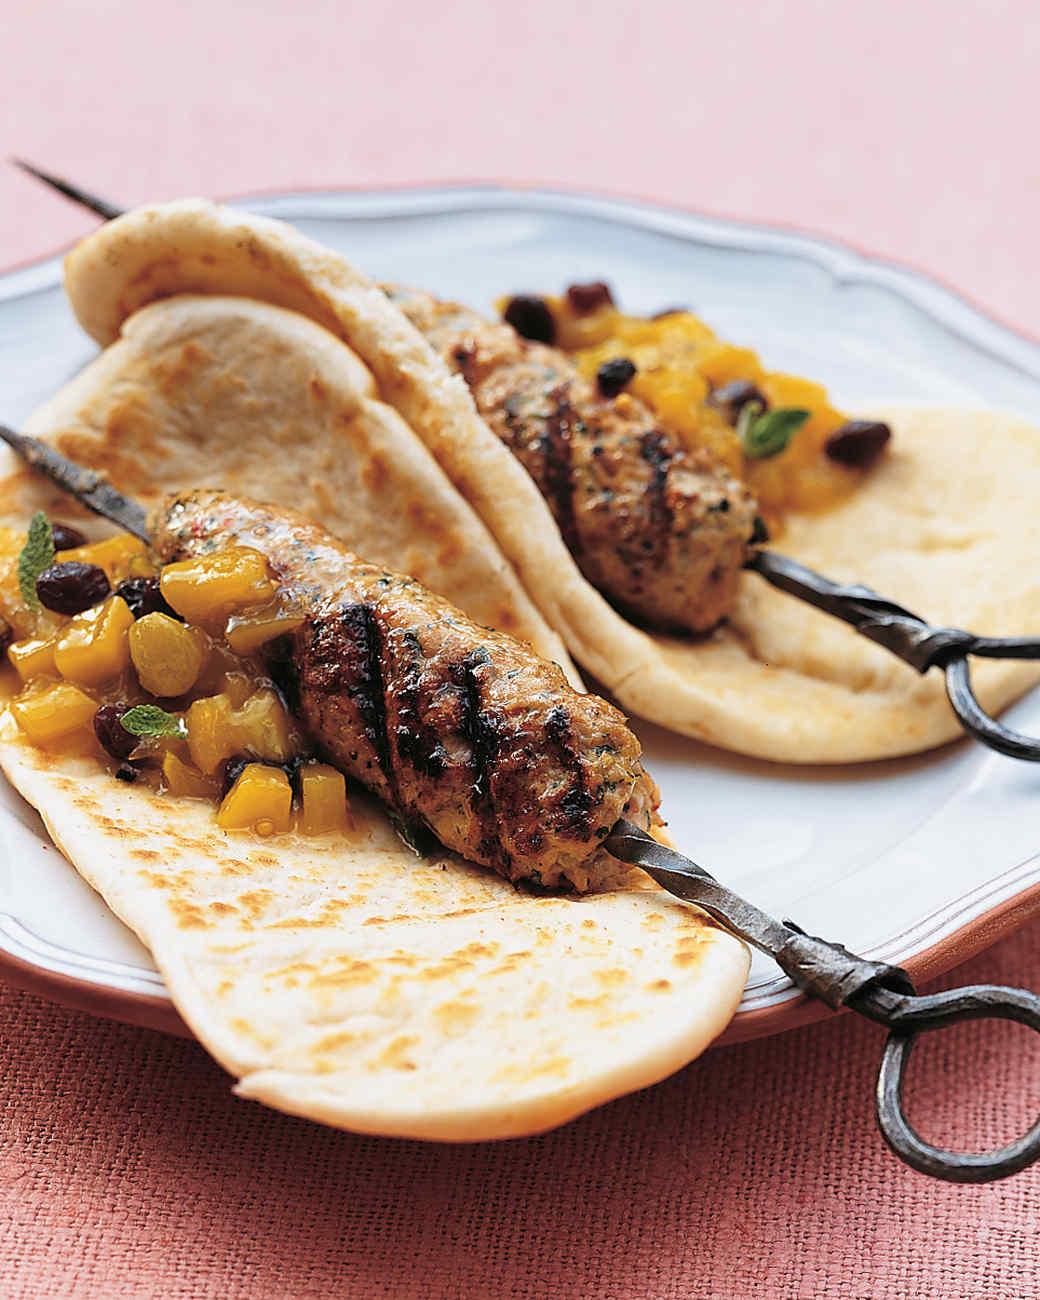 Chicken and Pork Seekh Kebabs